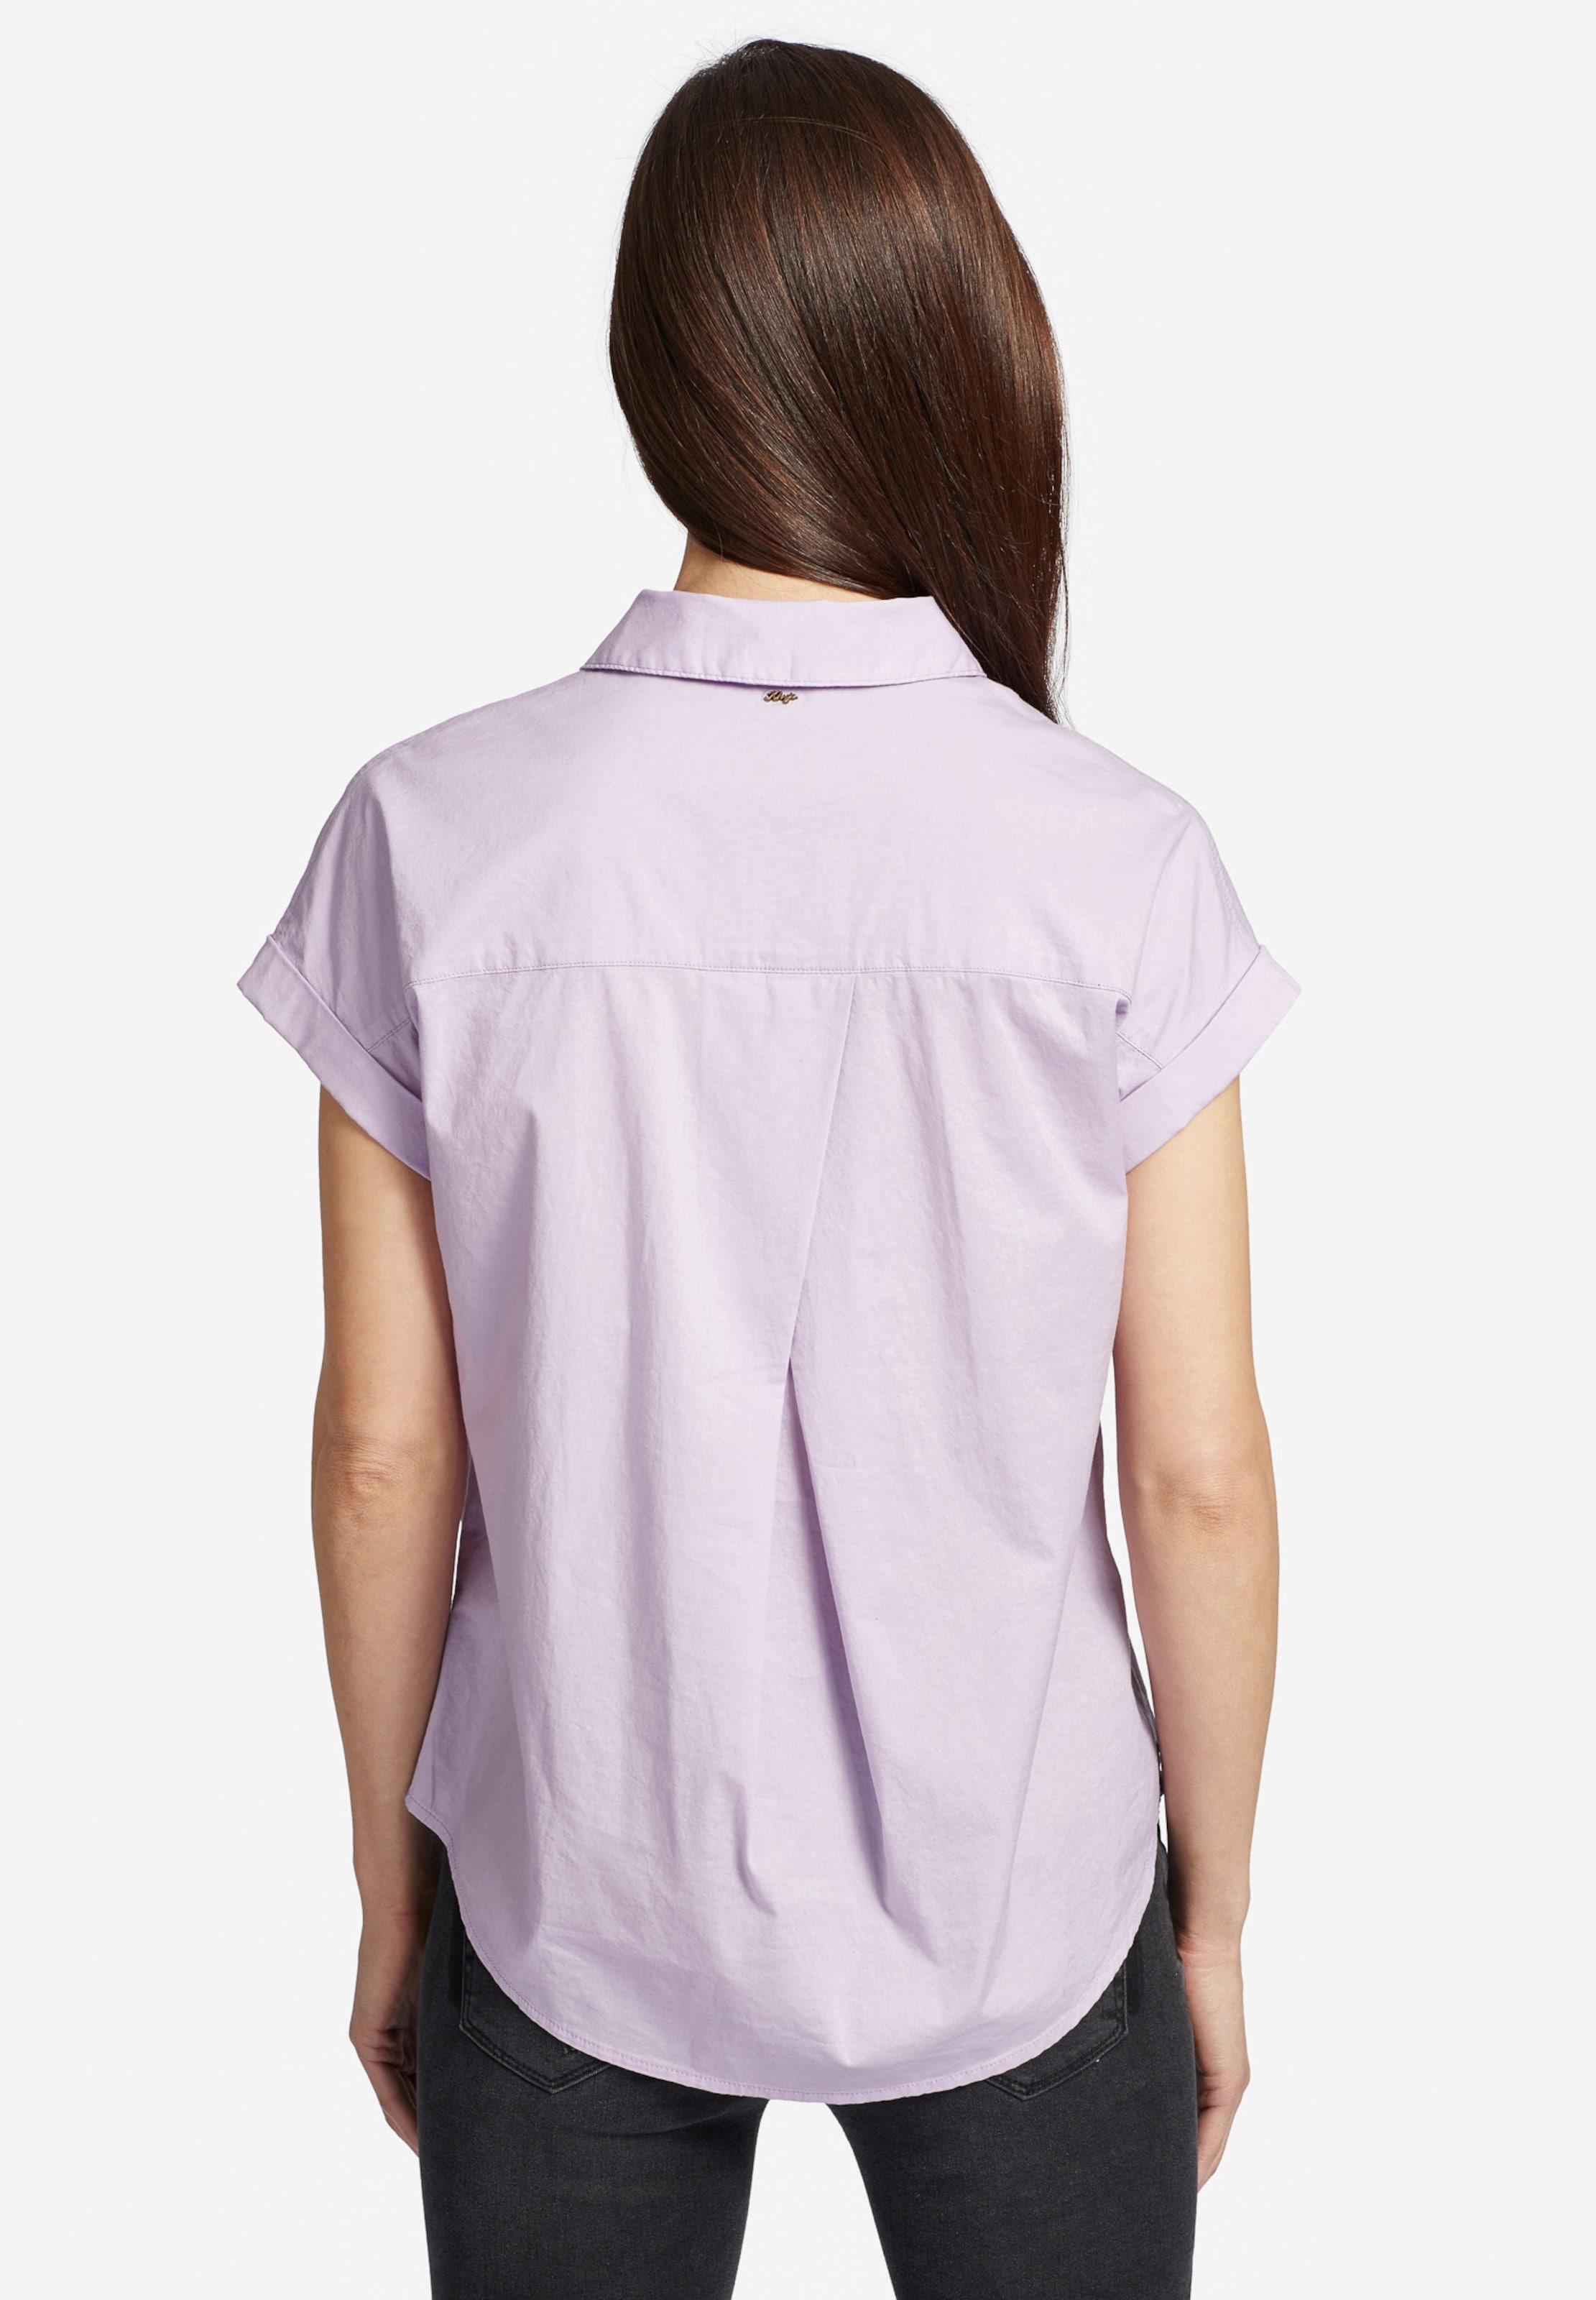 Pastelllila Khujo 'jello' 'jello' Khujo Pastelllila In Khujo Bluse In Bluse Bluse 3A4jRL5